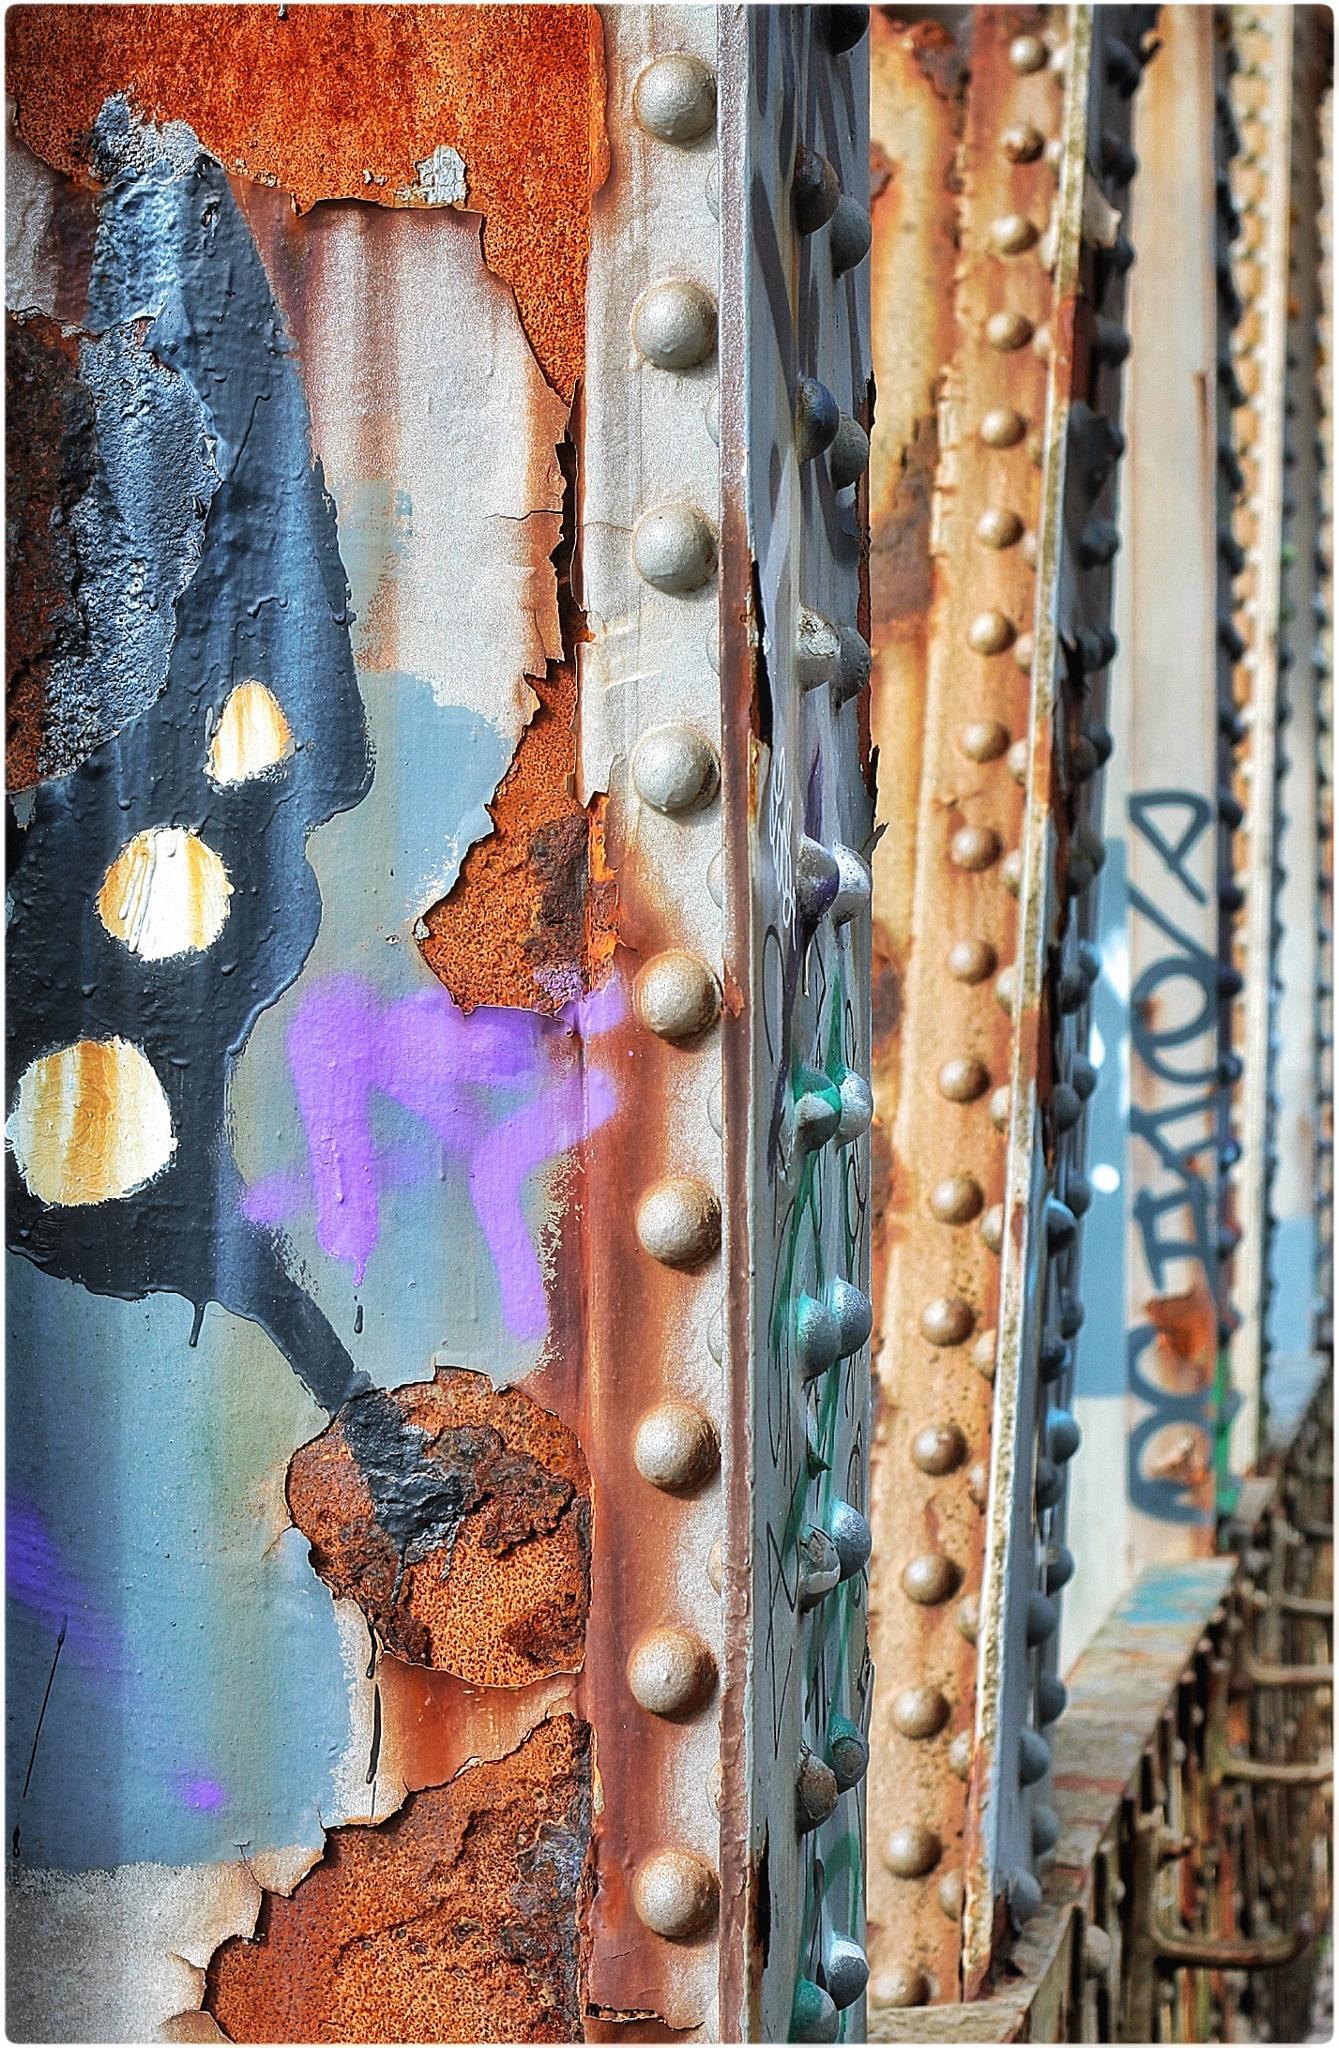 Layers by John John McLane Freelance photographer